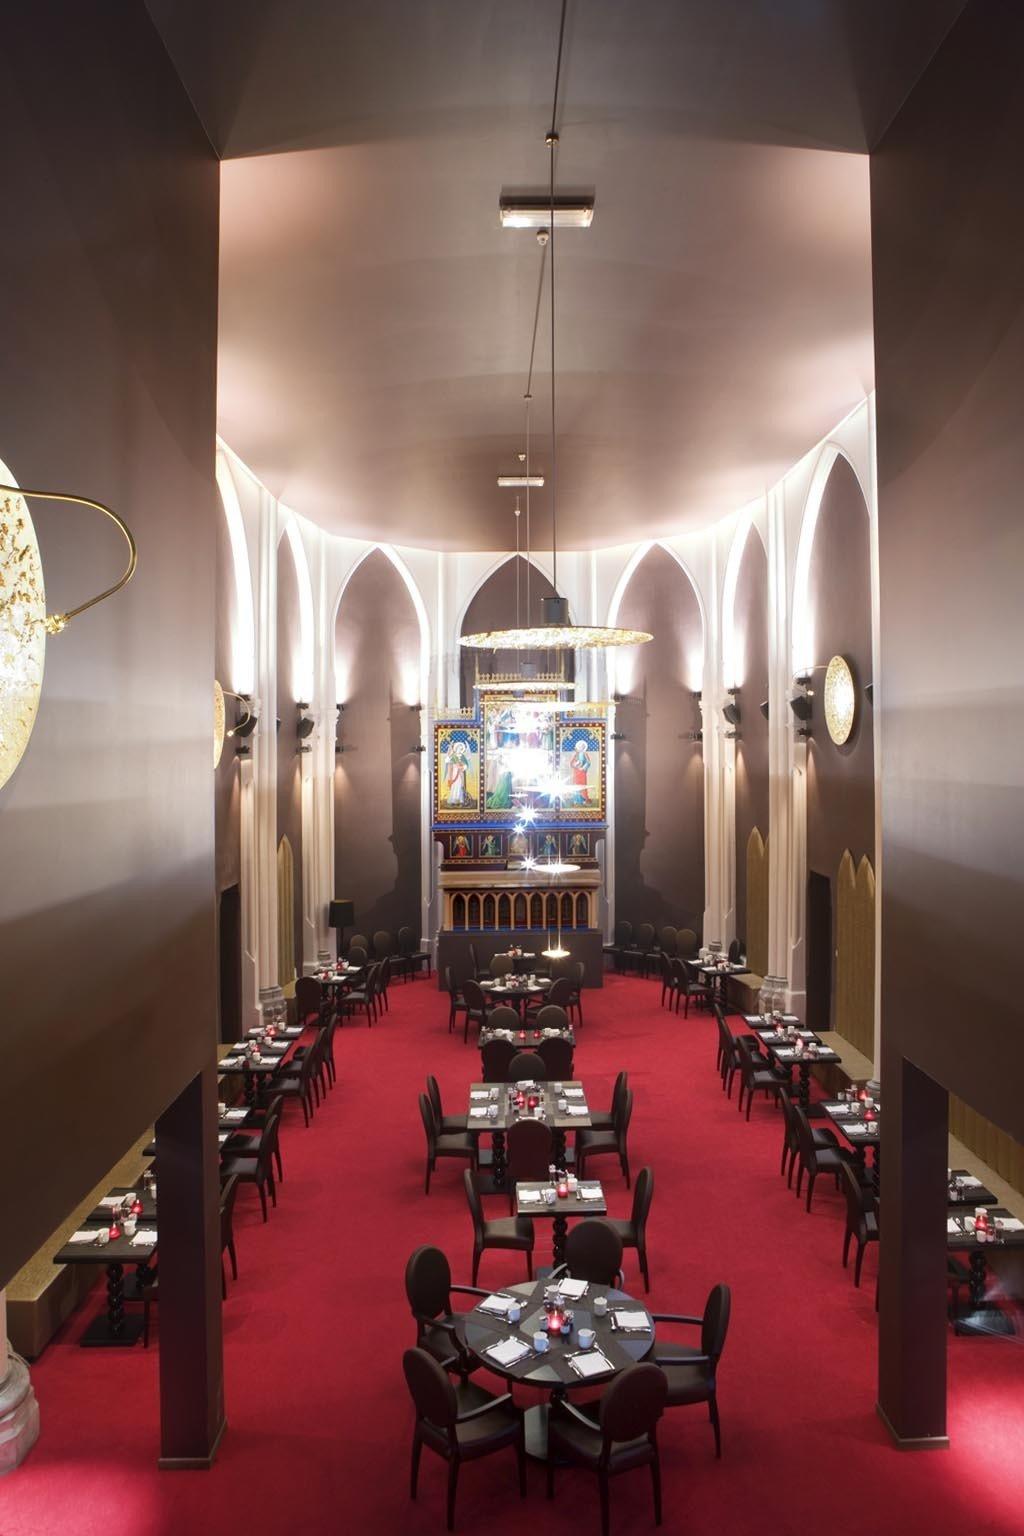 City Cultural Dining Drink Eat Historic function hall lighting restaurant